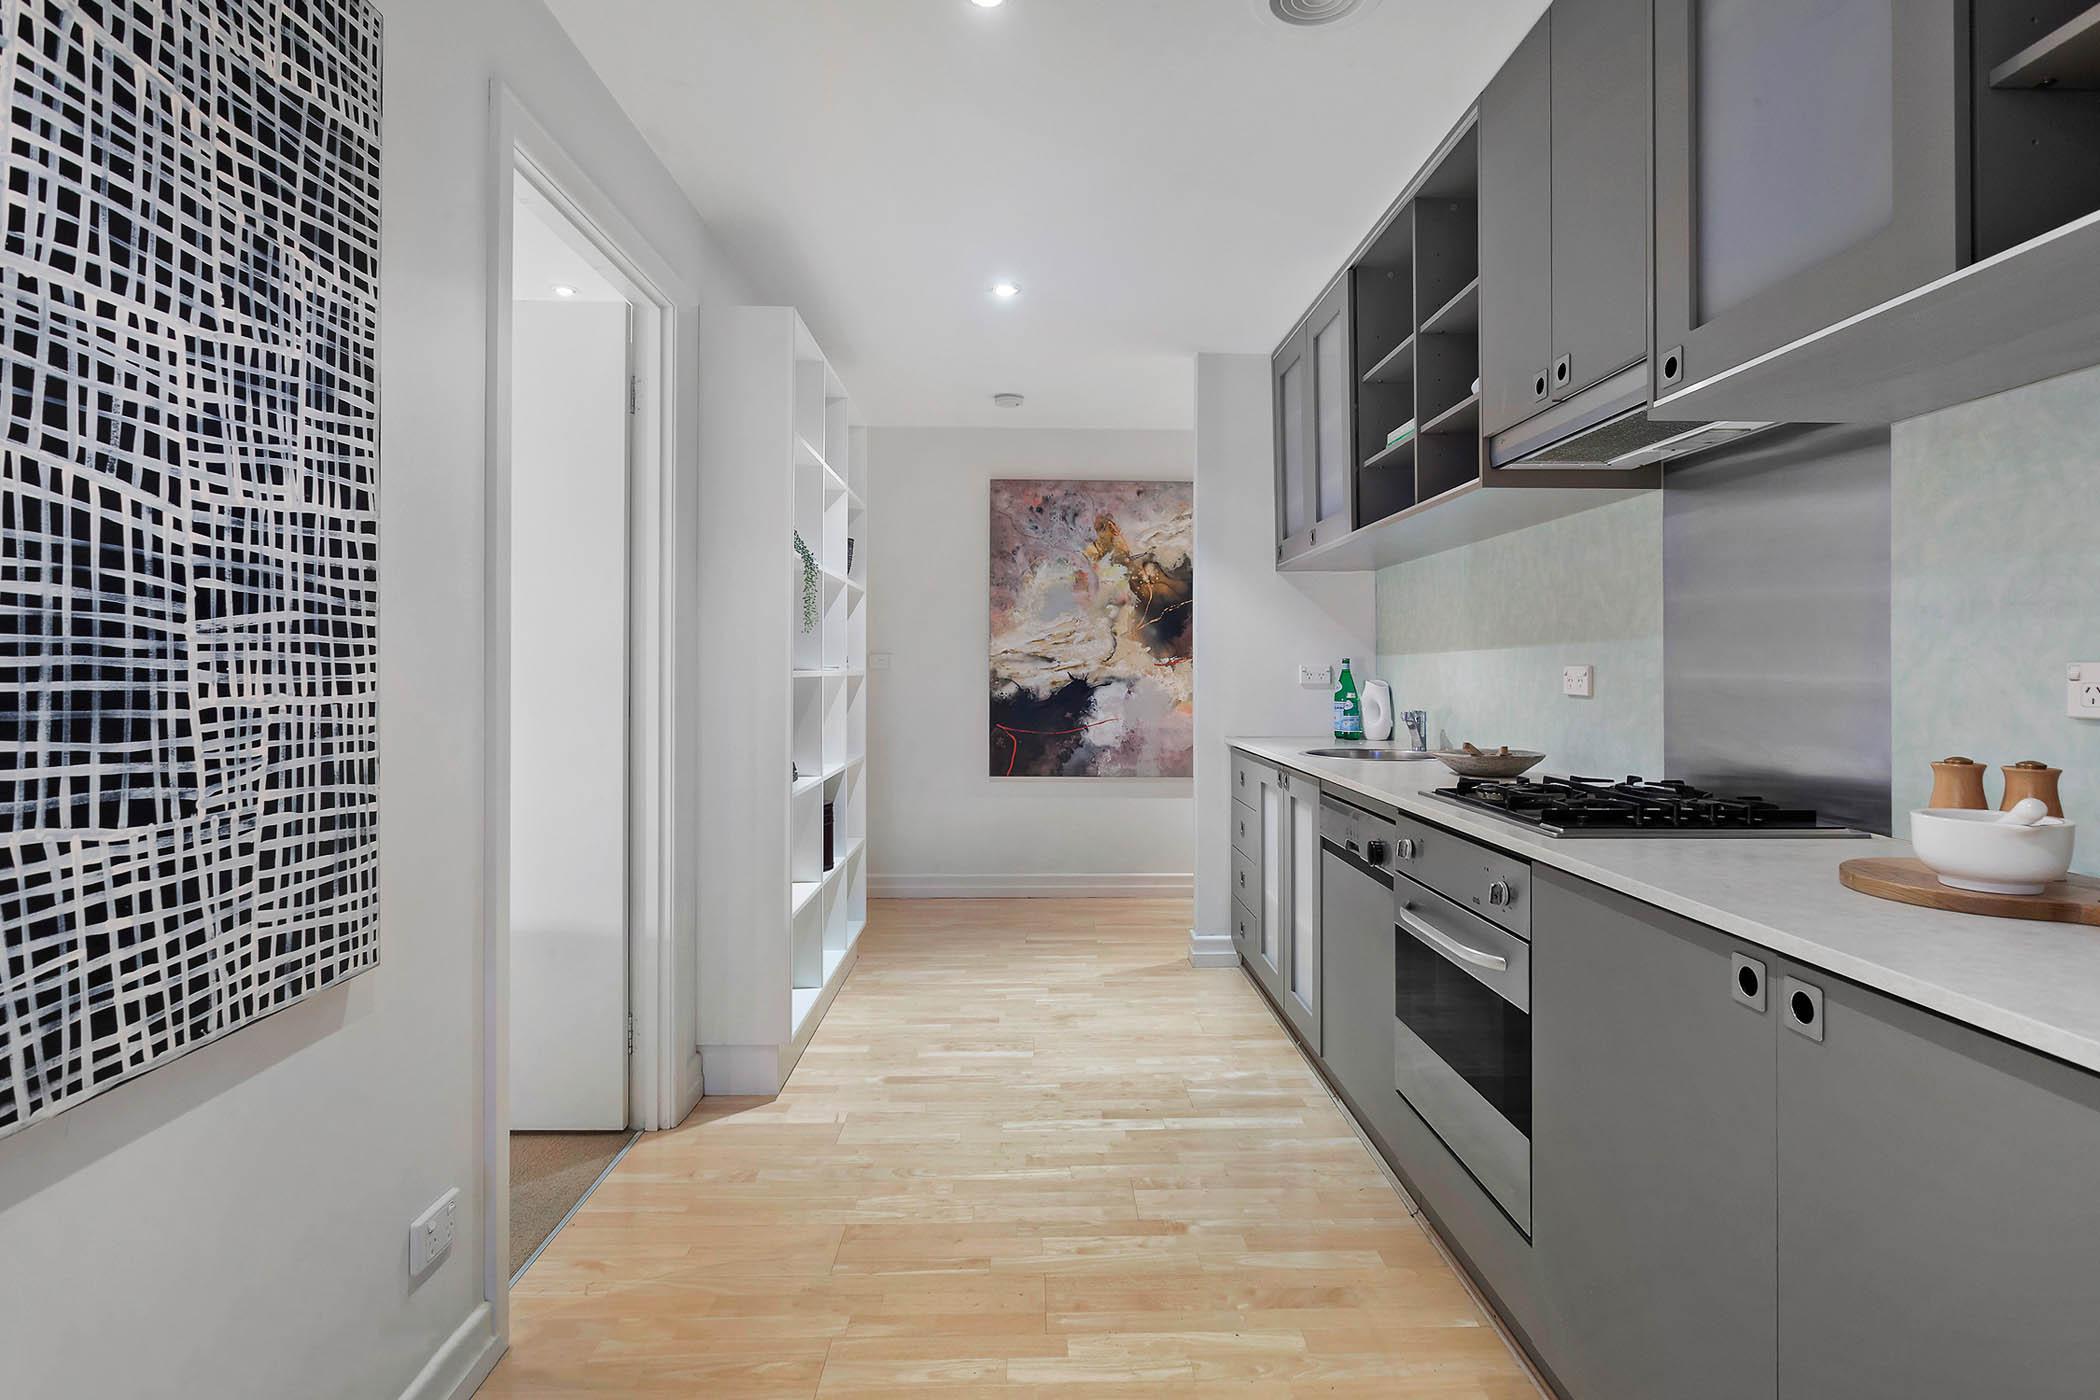 1804-31-spring-street-melbourne-student-accommodation-Melbourne-Kitchen-2-Unilodgers